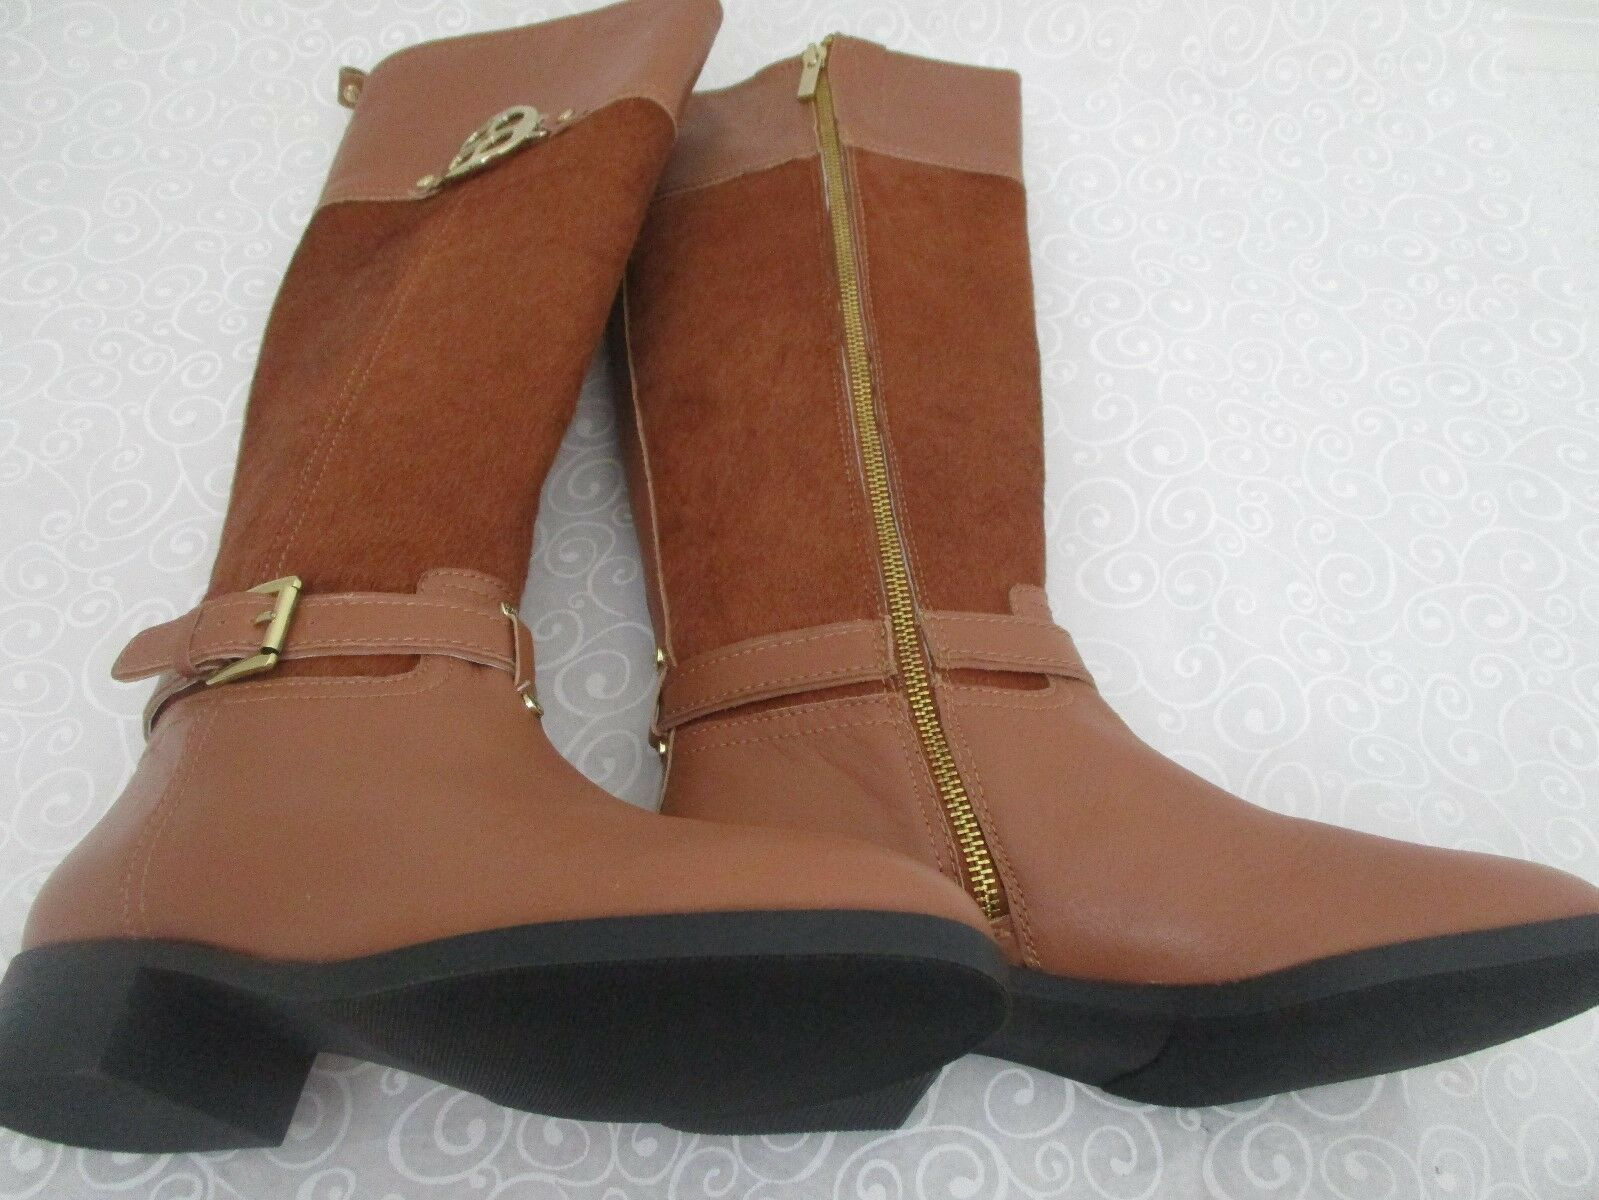 IMAN marron LEATHER PONYHAIR KNEE KNEE KNEE HIGH bottes Taille 7 1 2 M - NEW 5f540c